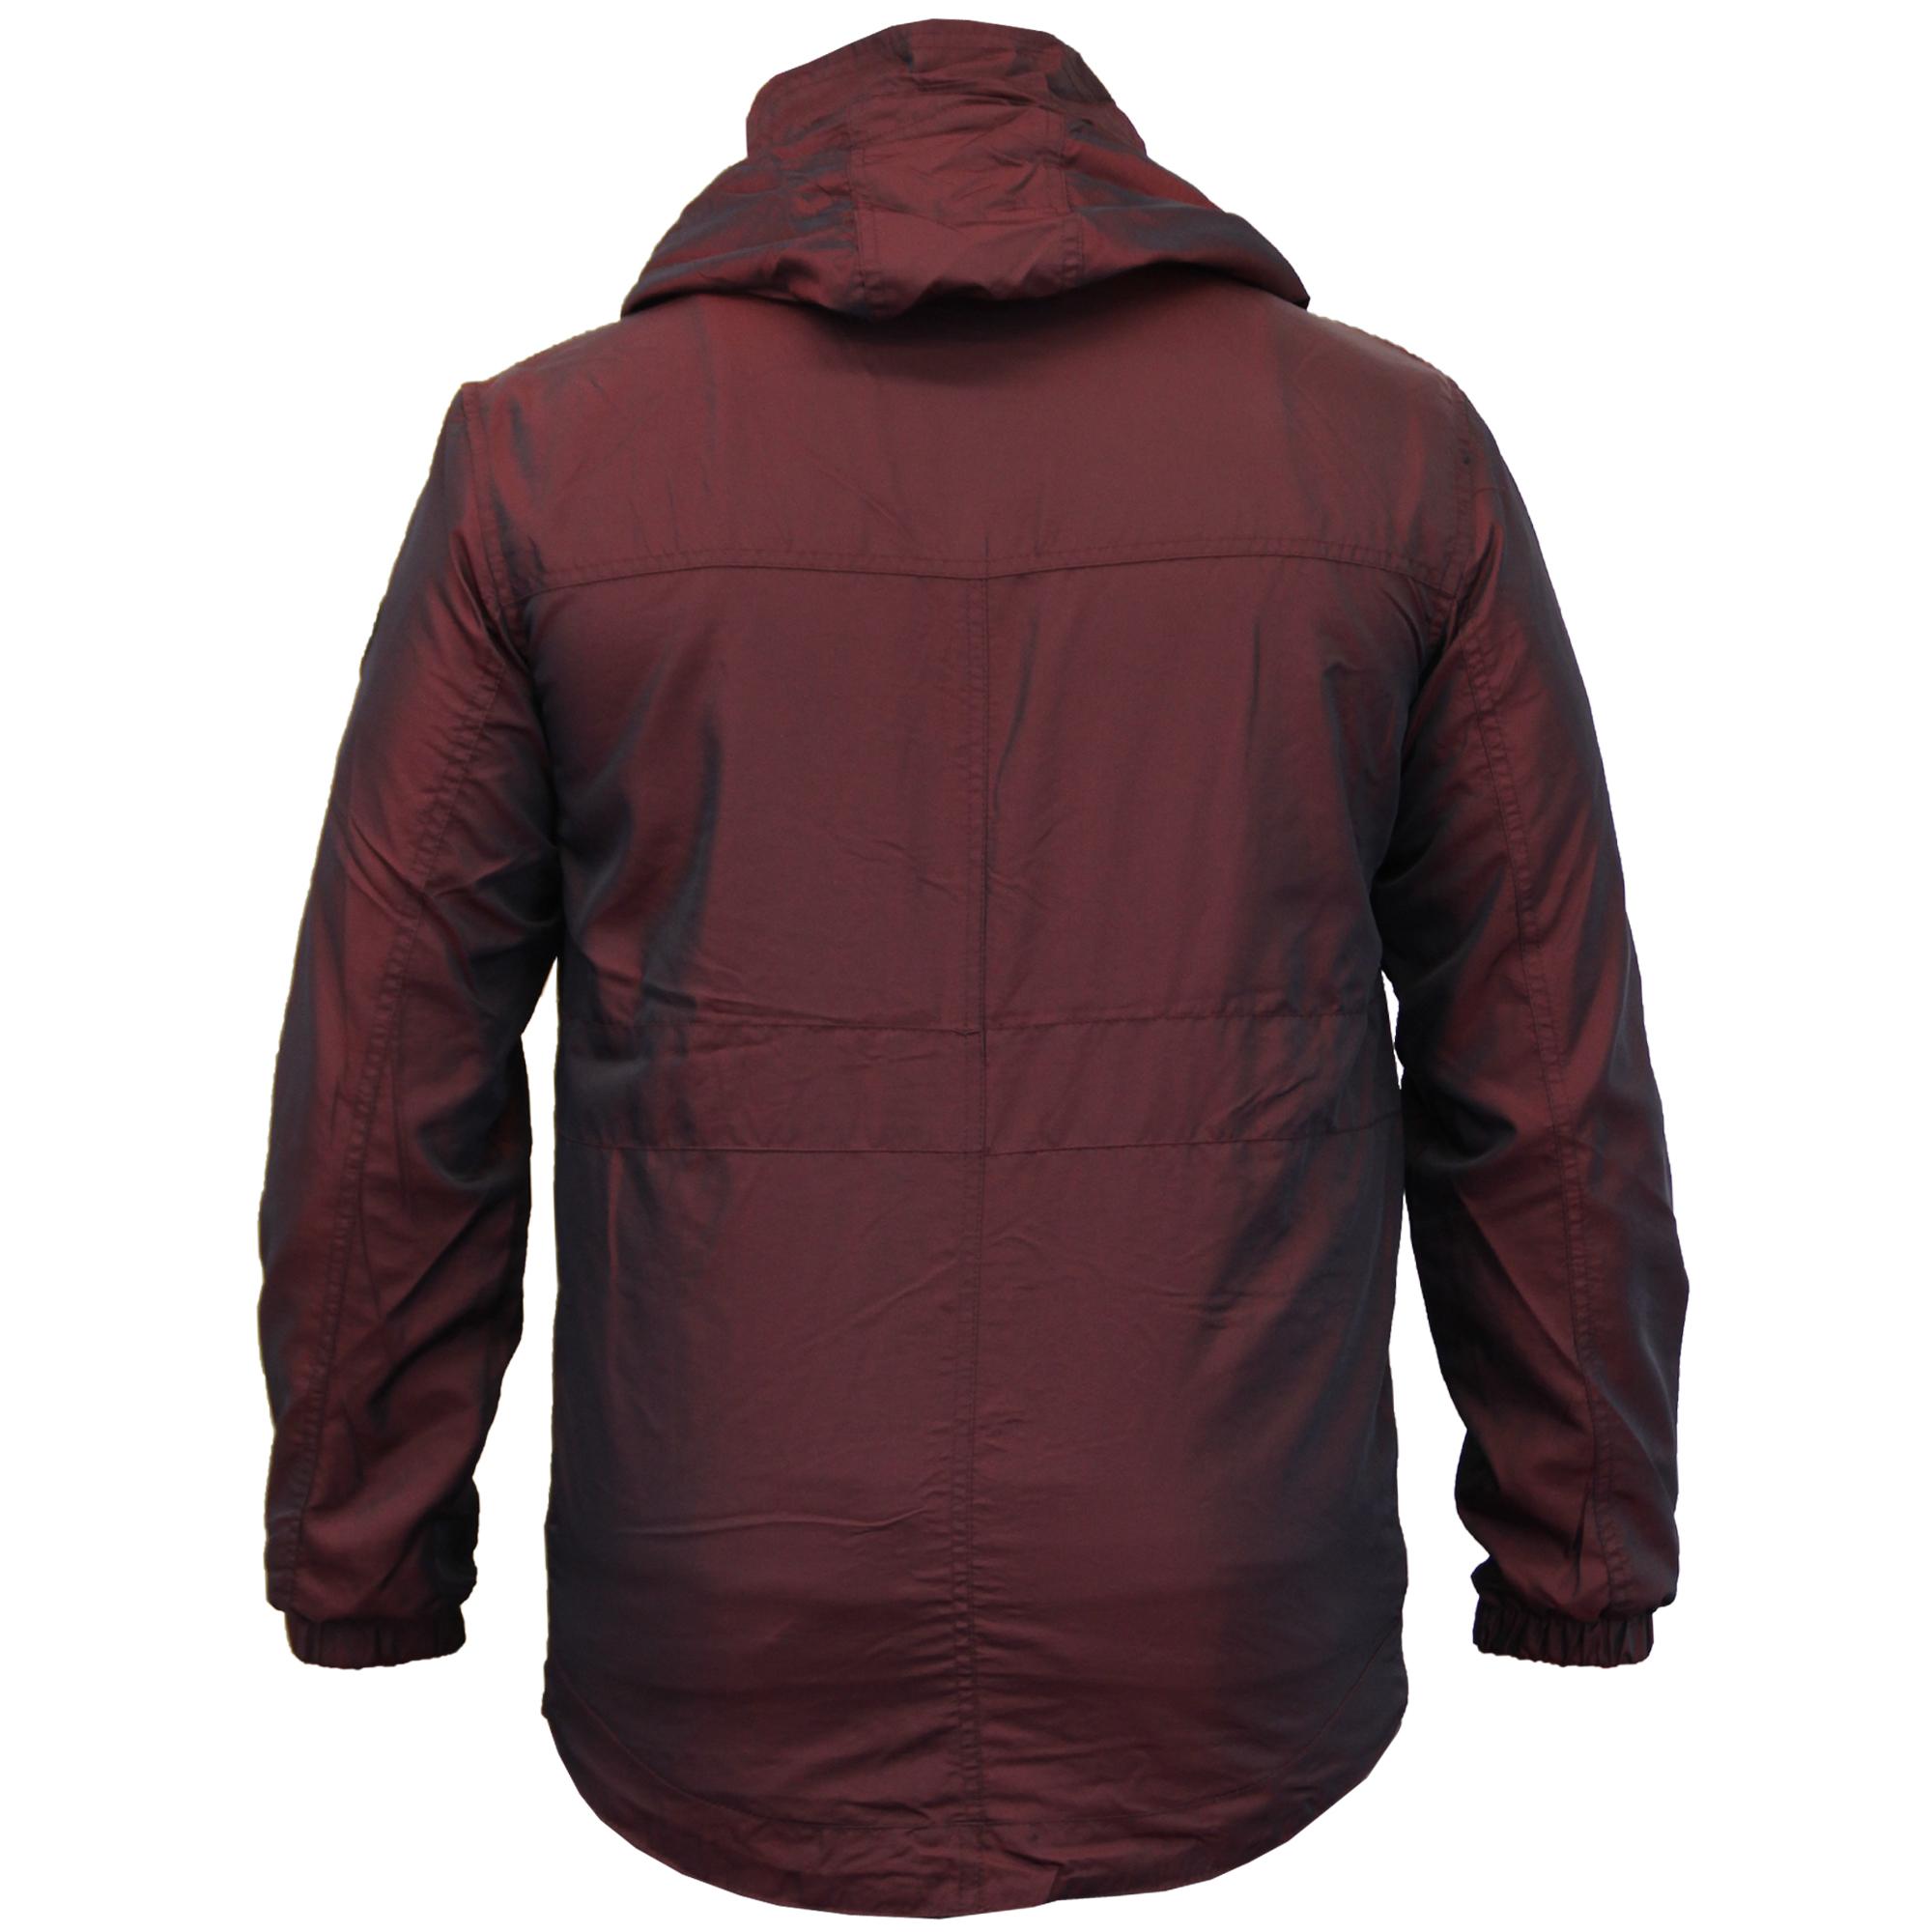 Mens-Windbreaker-Jacket-Crosshatch-Coat-Hooded-Mesh-Lined-Zip-Casual-Summer-New thumbnail 12